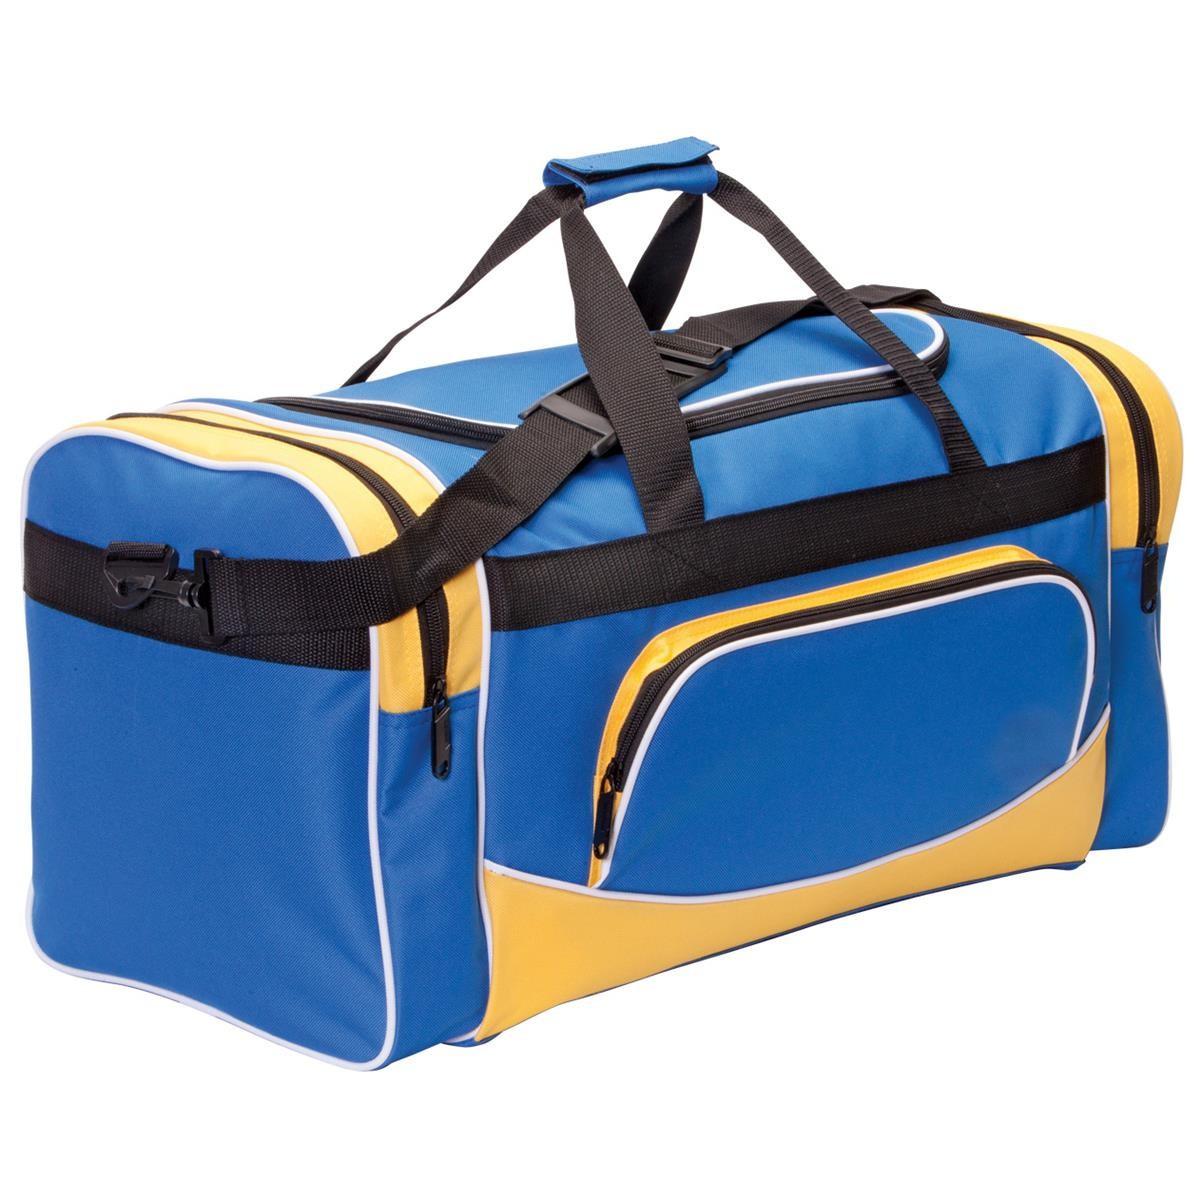 Ranger Sports Bag - Royal & Gold